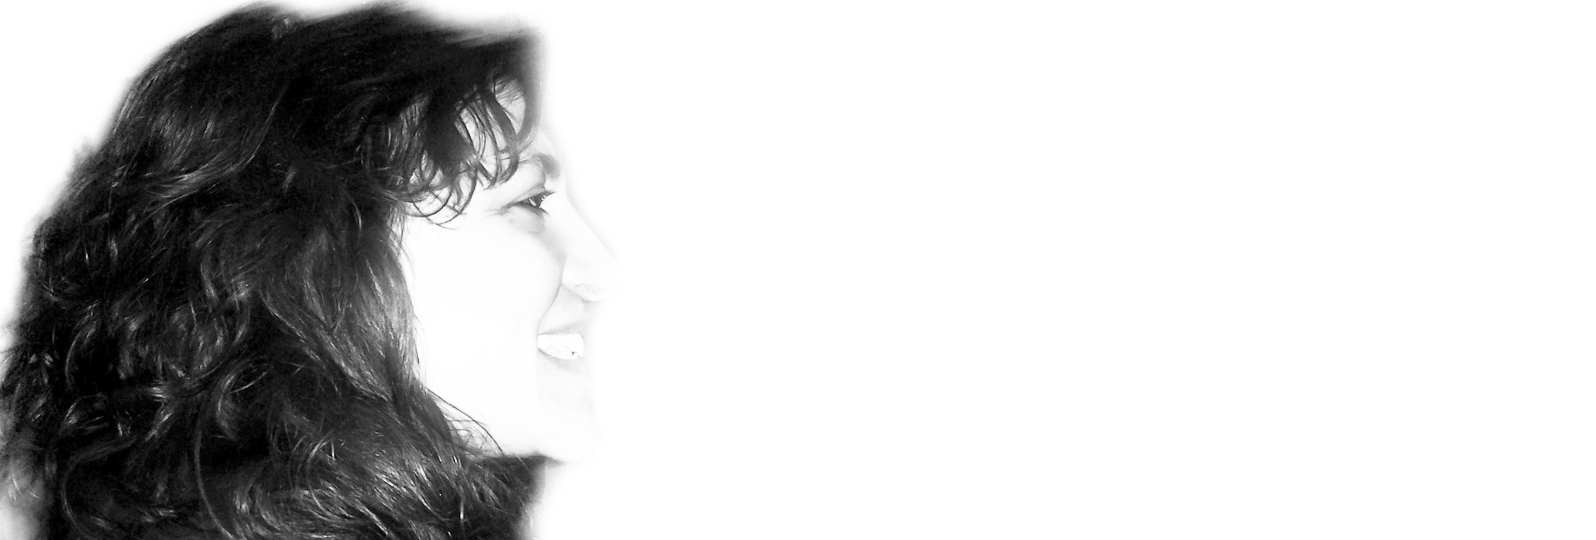 zucarelli-profile-19.jpg